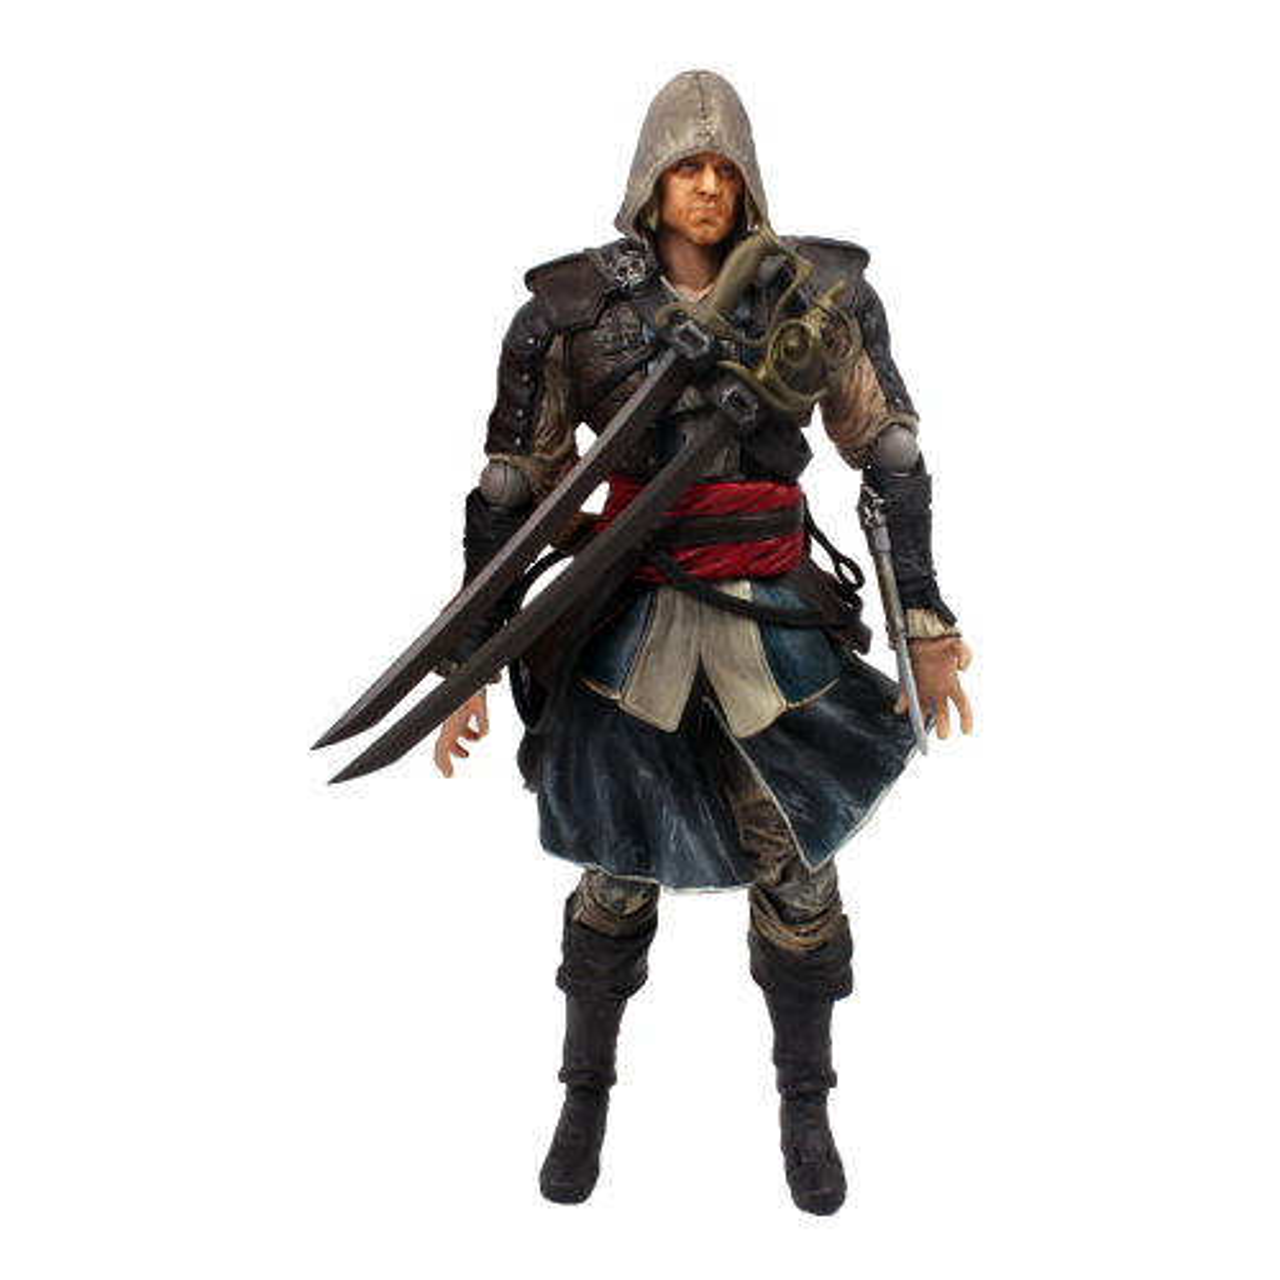 اکشن فیگور  پلی آرت مدل  Assassins Creed Black Flag